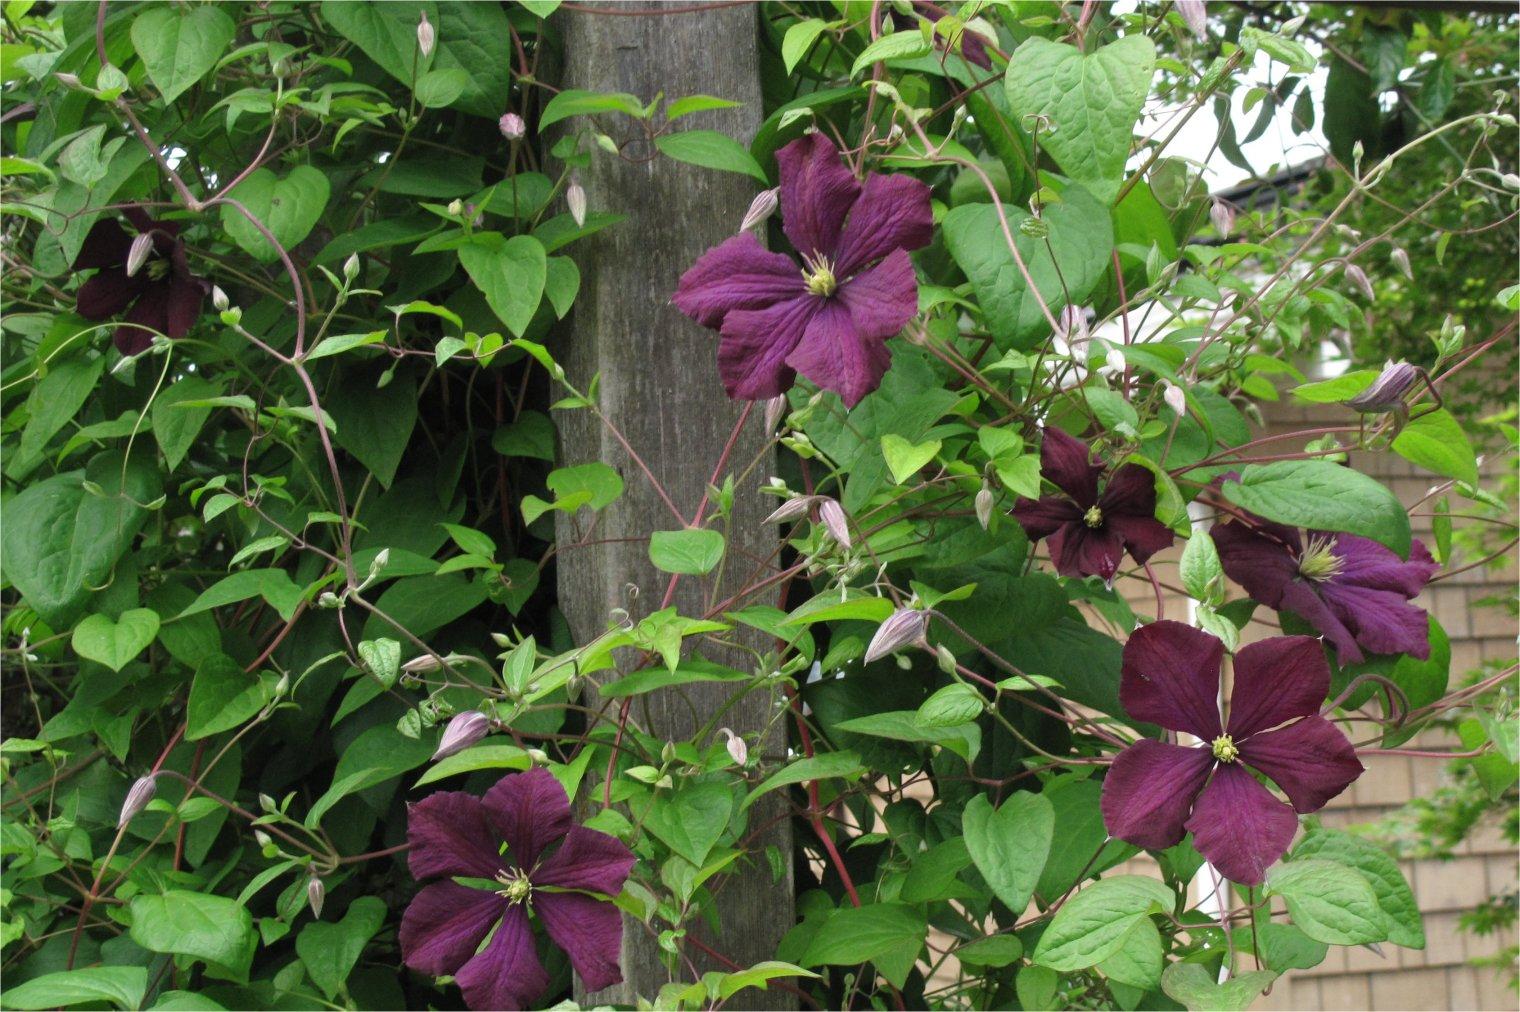 geranium x oxonianum claridge druce rain garden arts. Black Bedroom Furniture Sets. Home Design Ideas